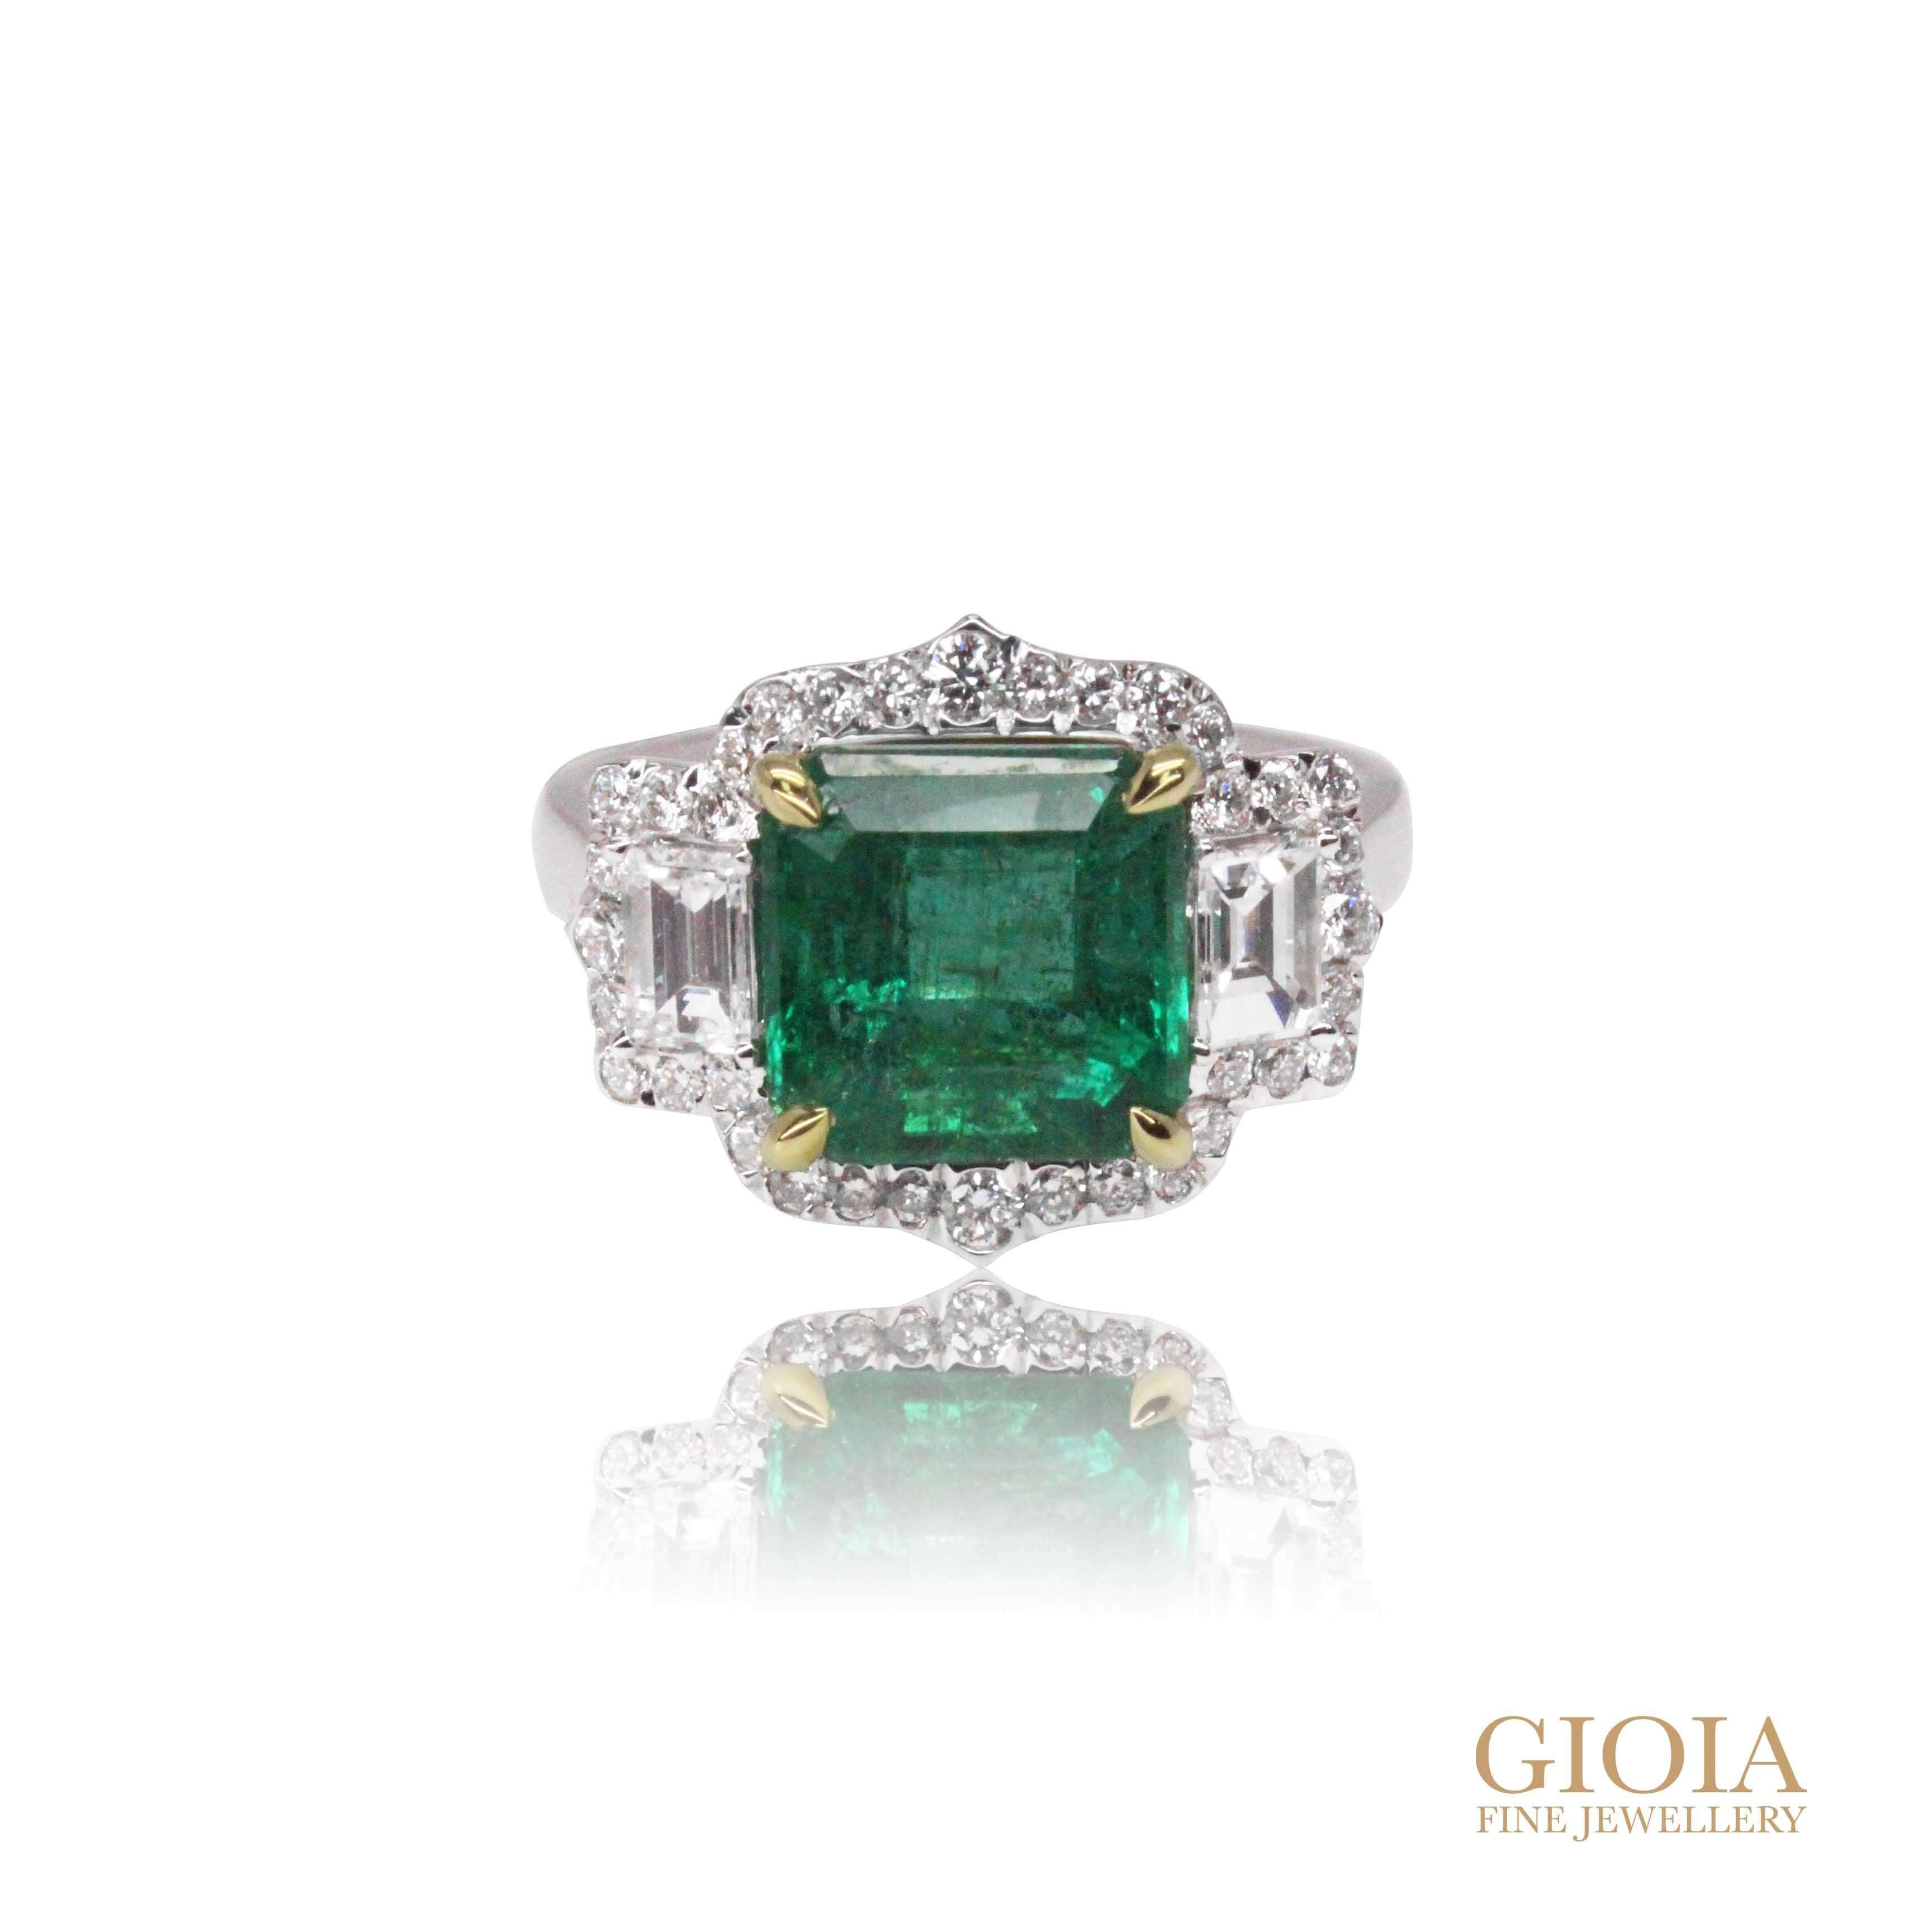 customised emerald gemstone ring | Bespoke custom made local Singapore Jeweller